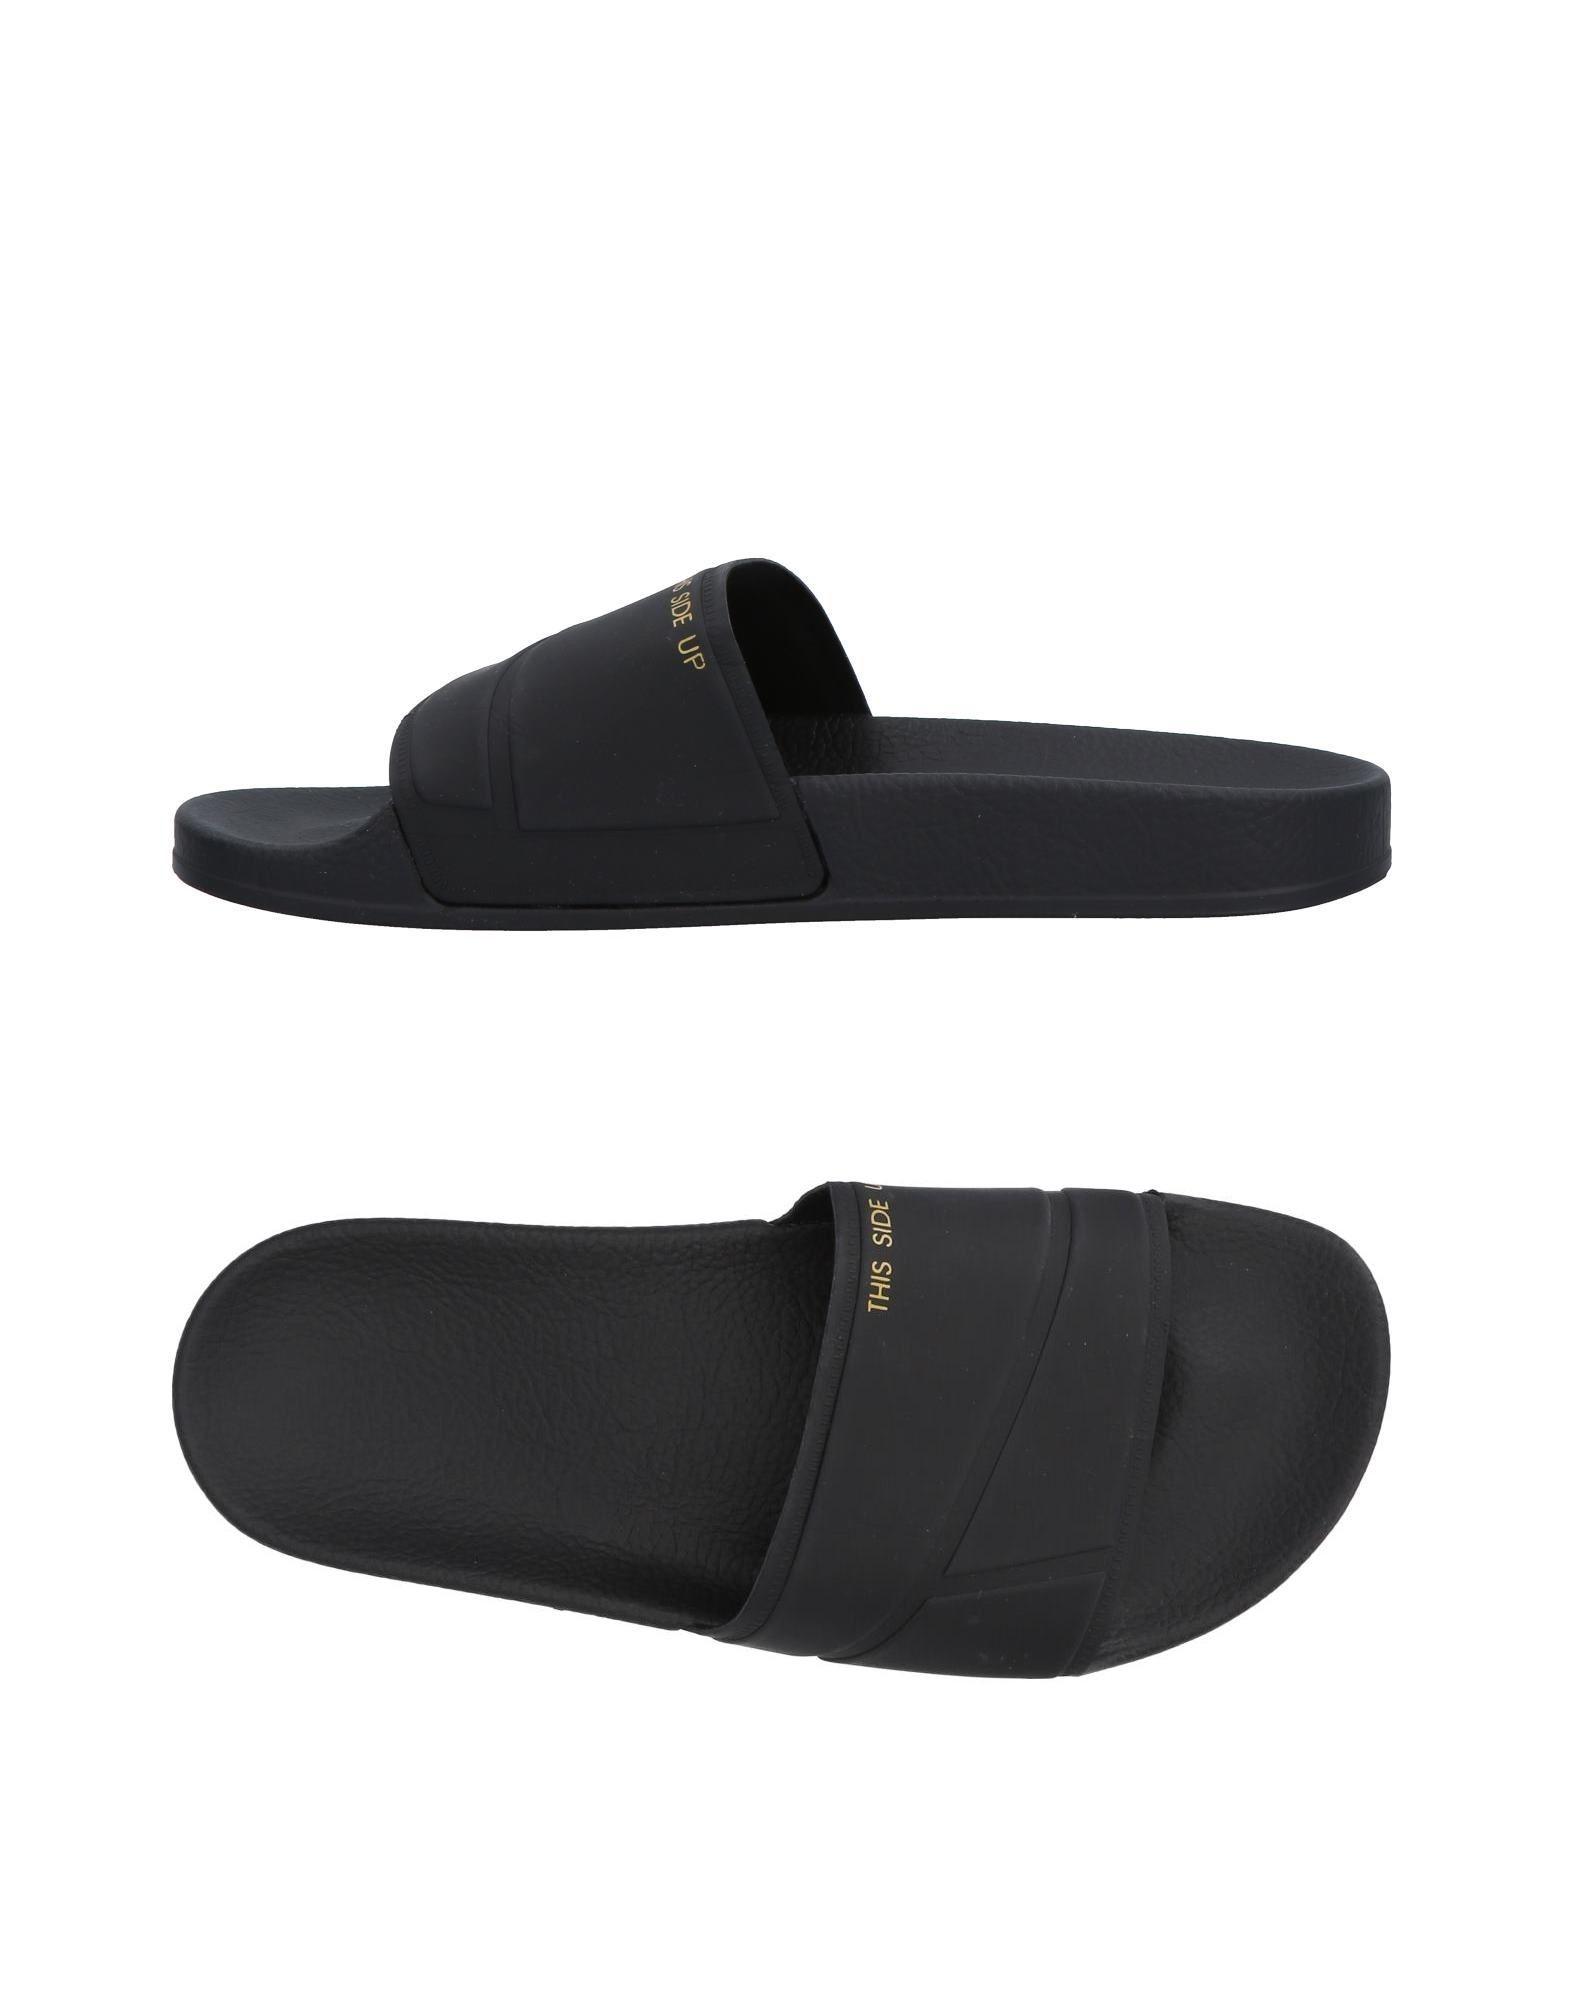 Adidas By Raf Simons Sandals - Simons Men Adidas By Raf Simons - Sandals online on  Canada - 11487283EO 08f20a